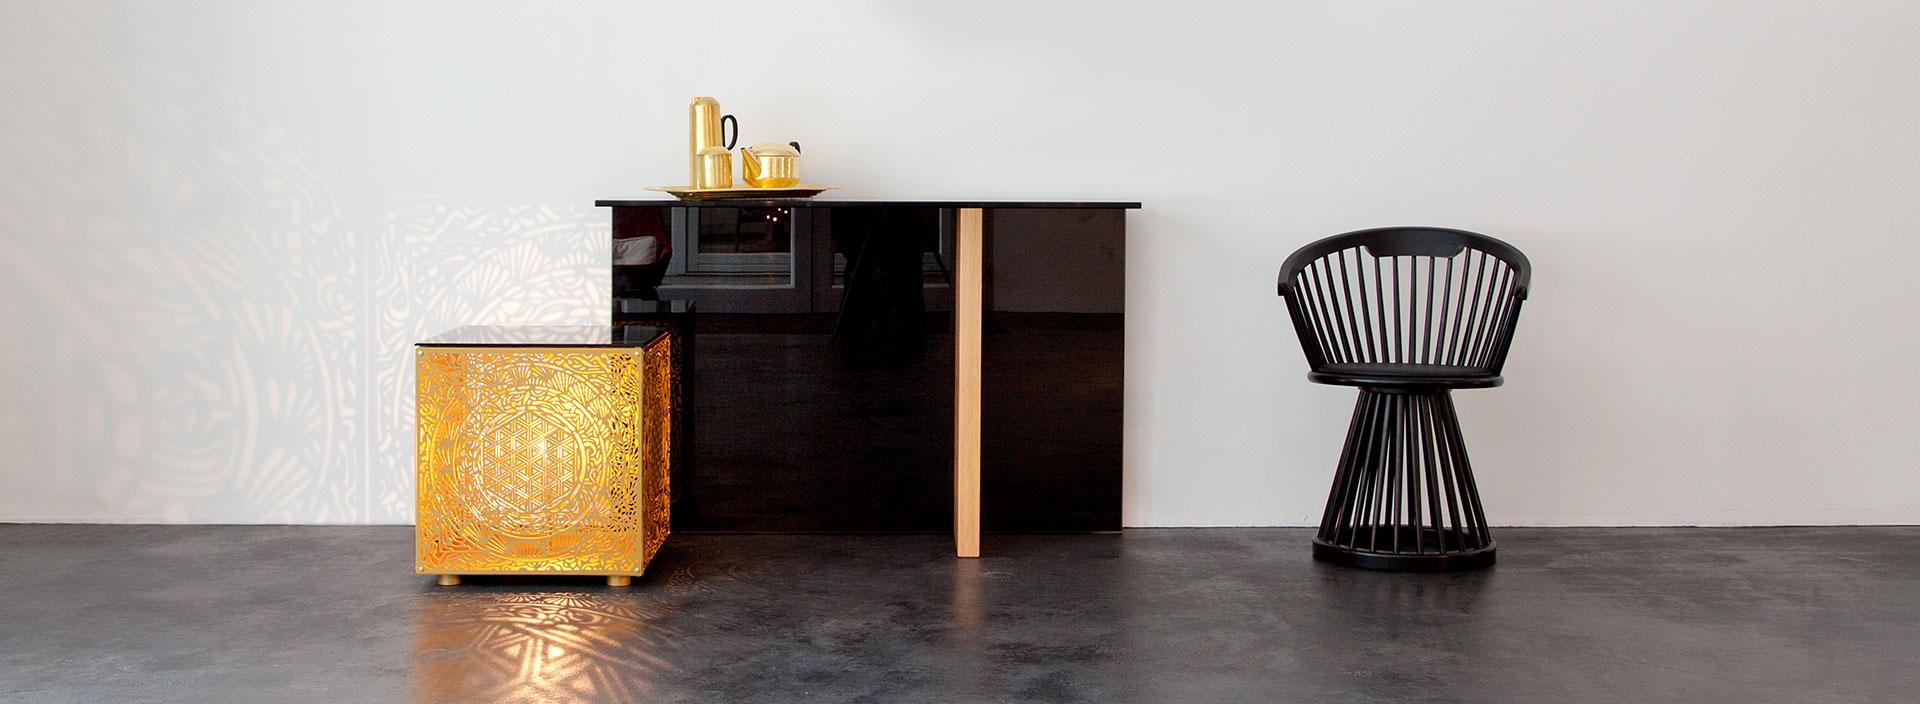 Sacrea Produkt-Bild: shop-interieur-header